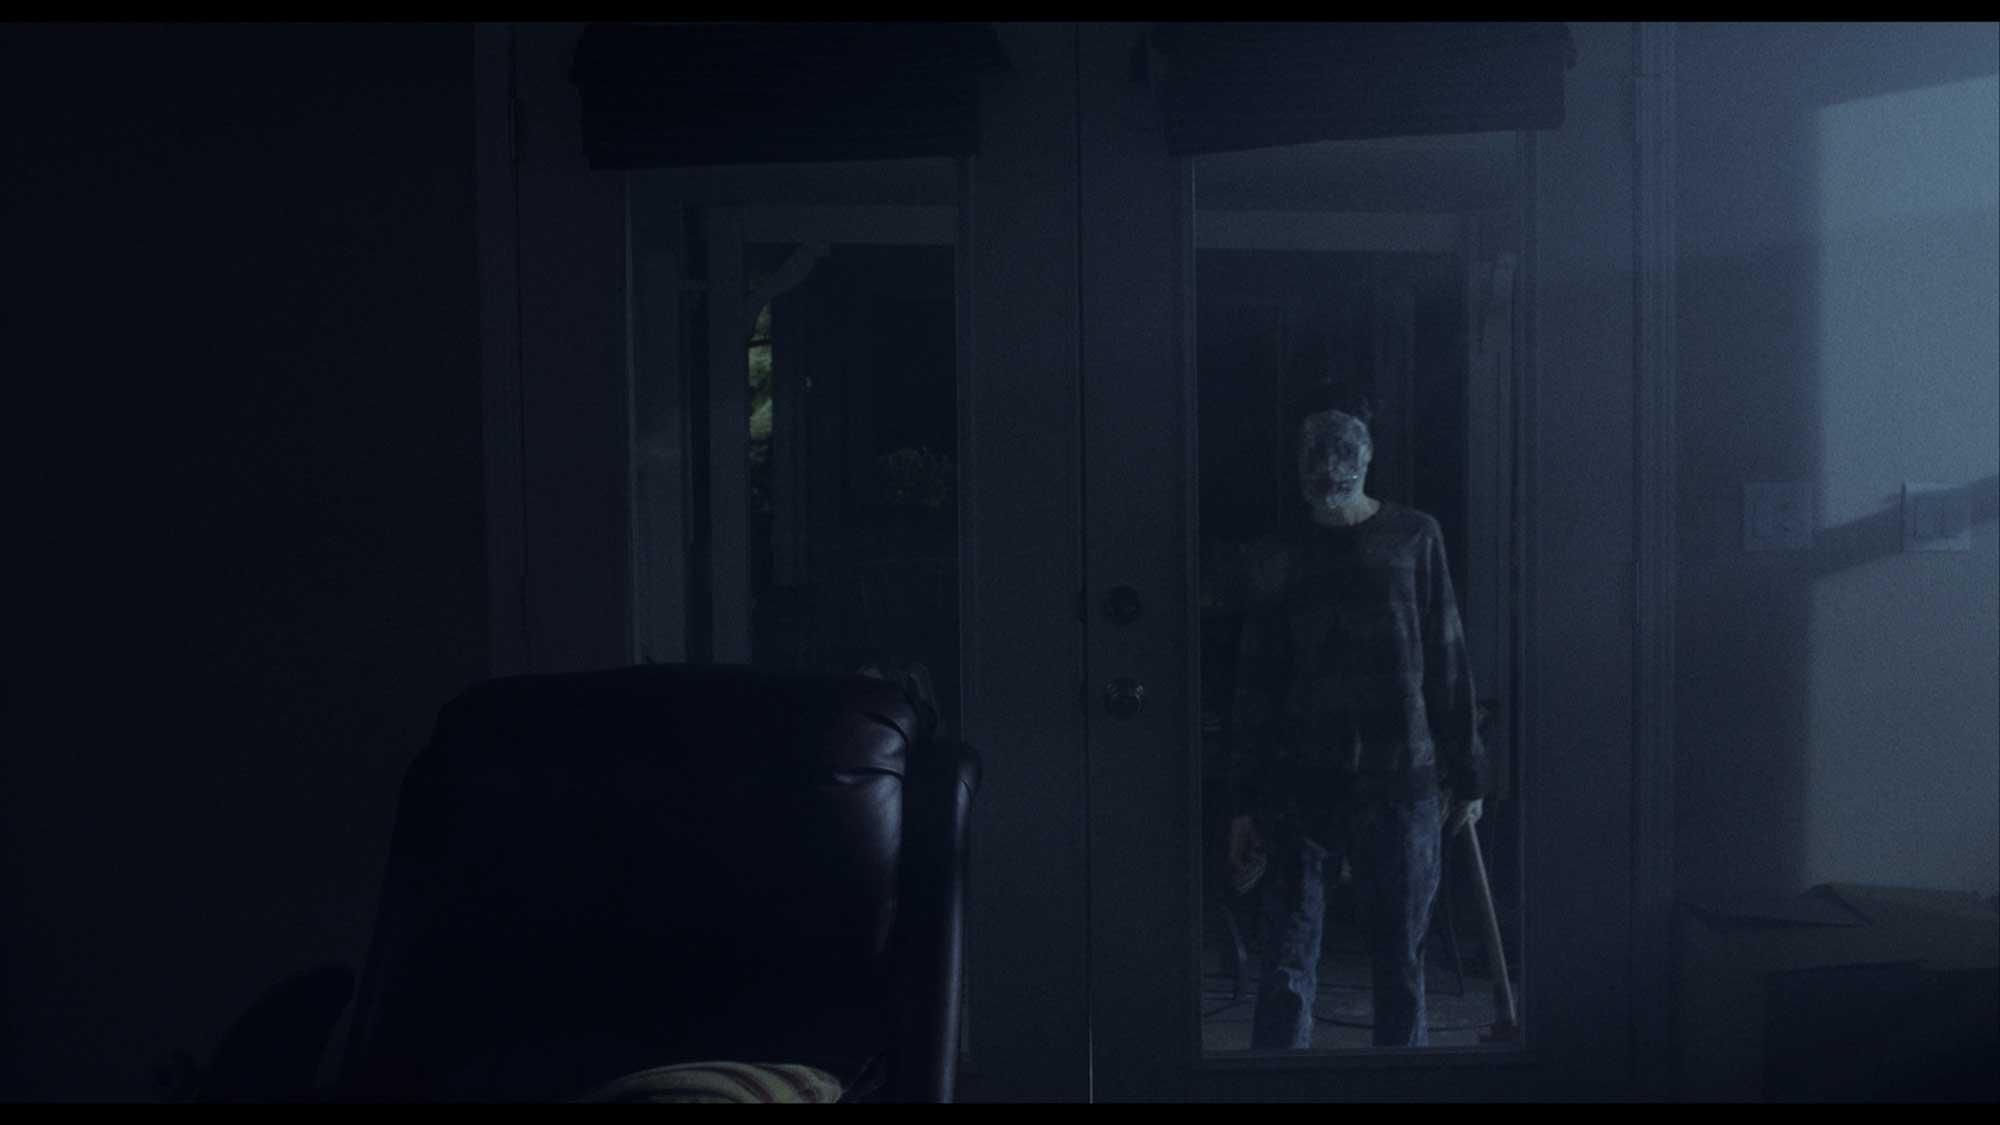 Barbara-House-Night-5.jpg